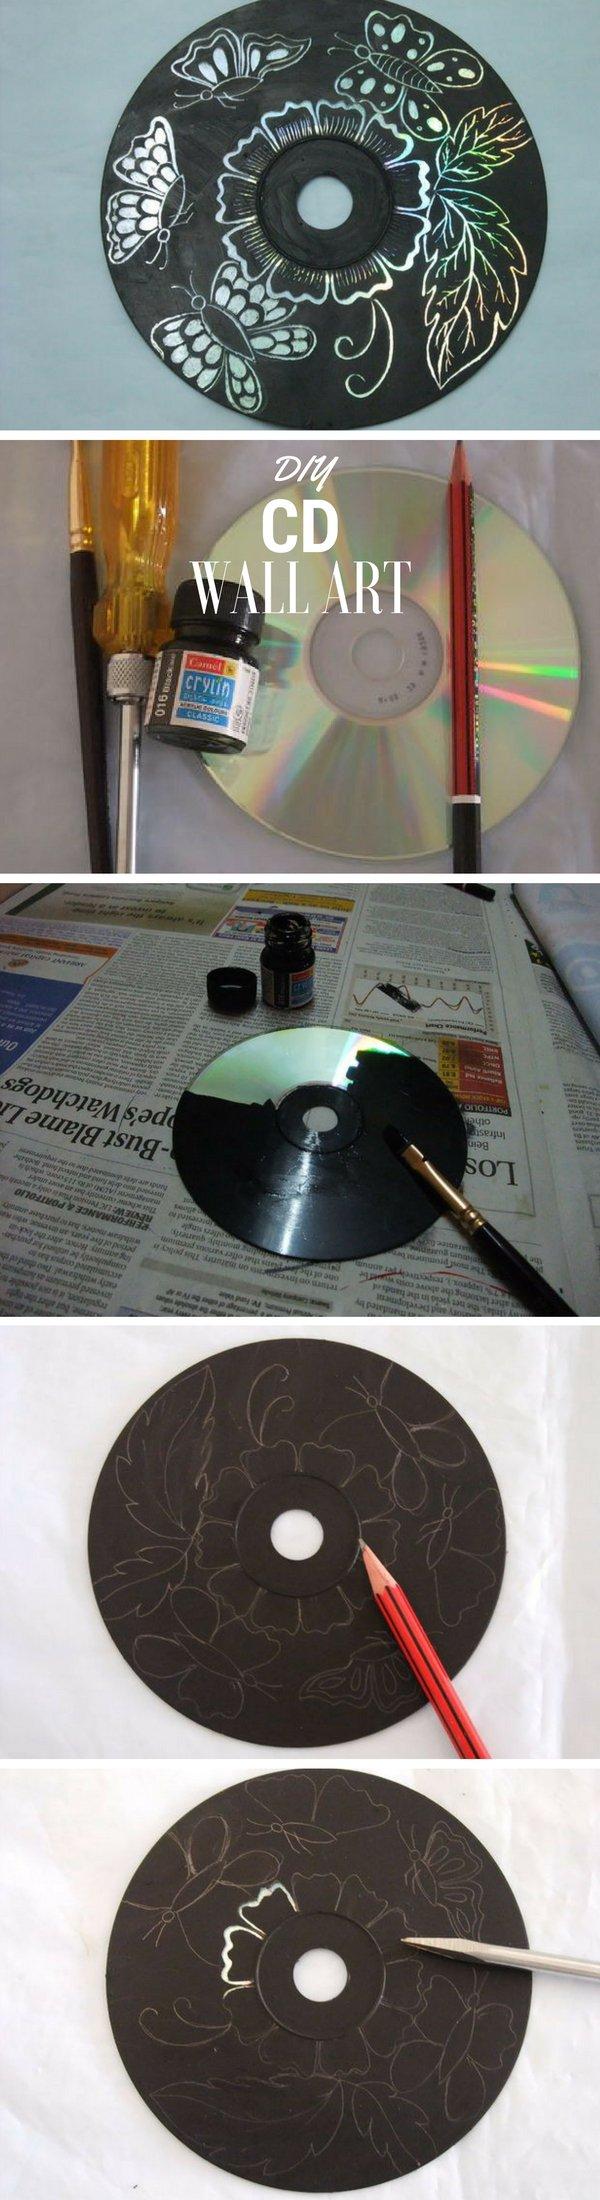 DIY CD Wall Art.